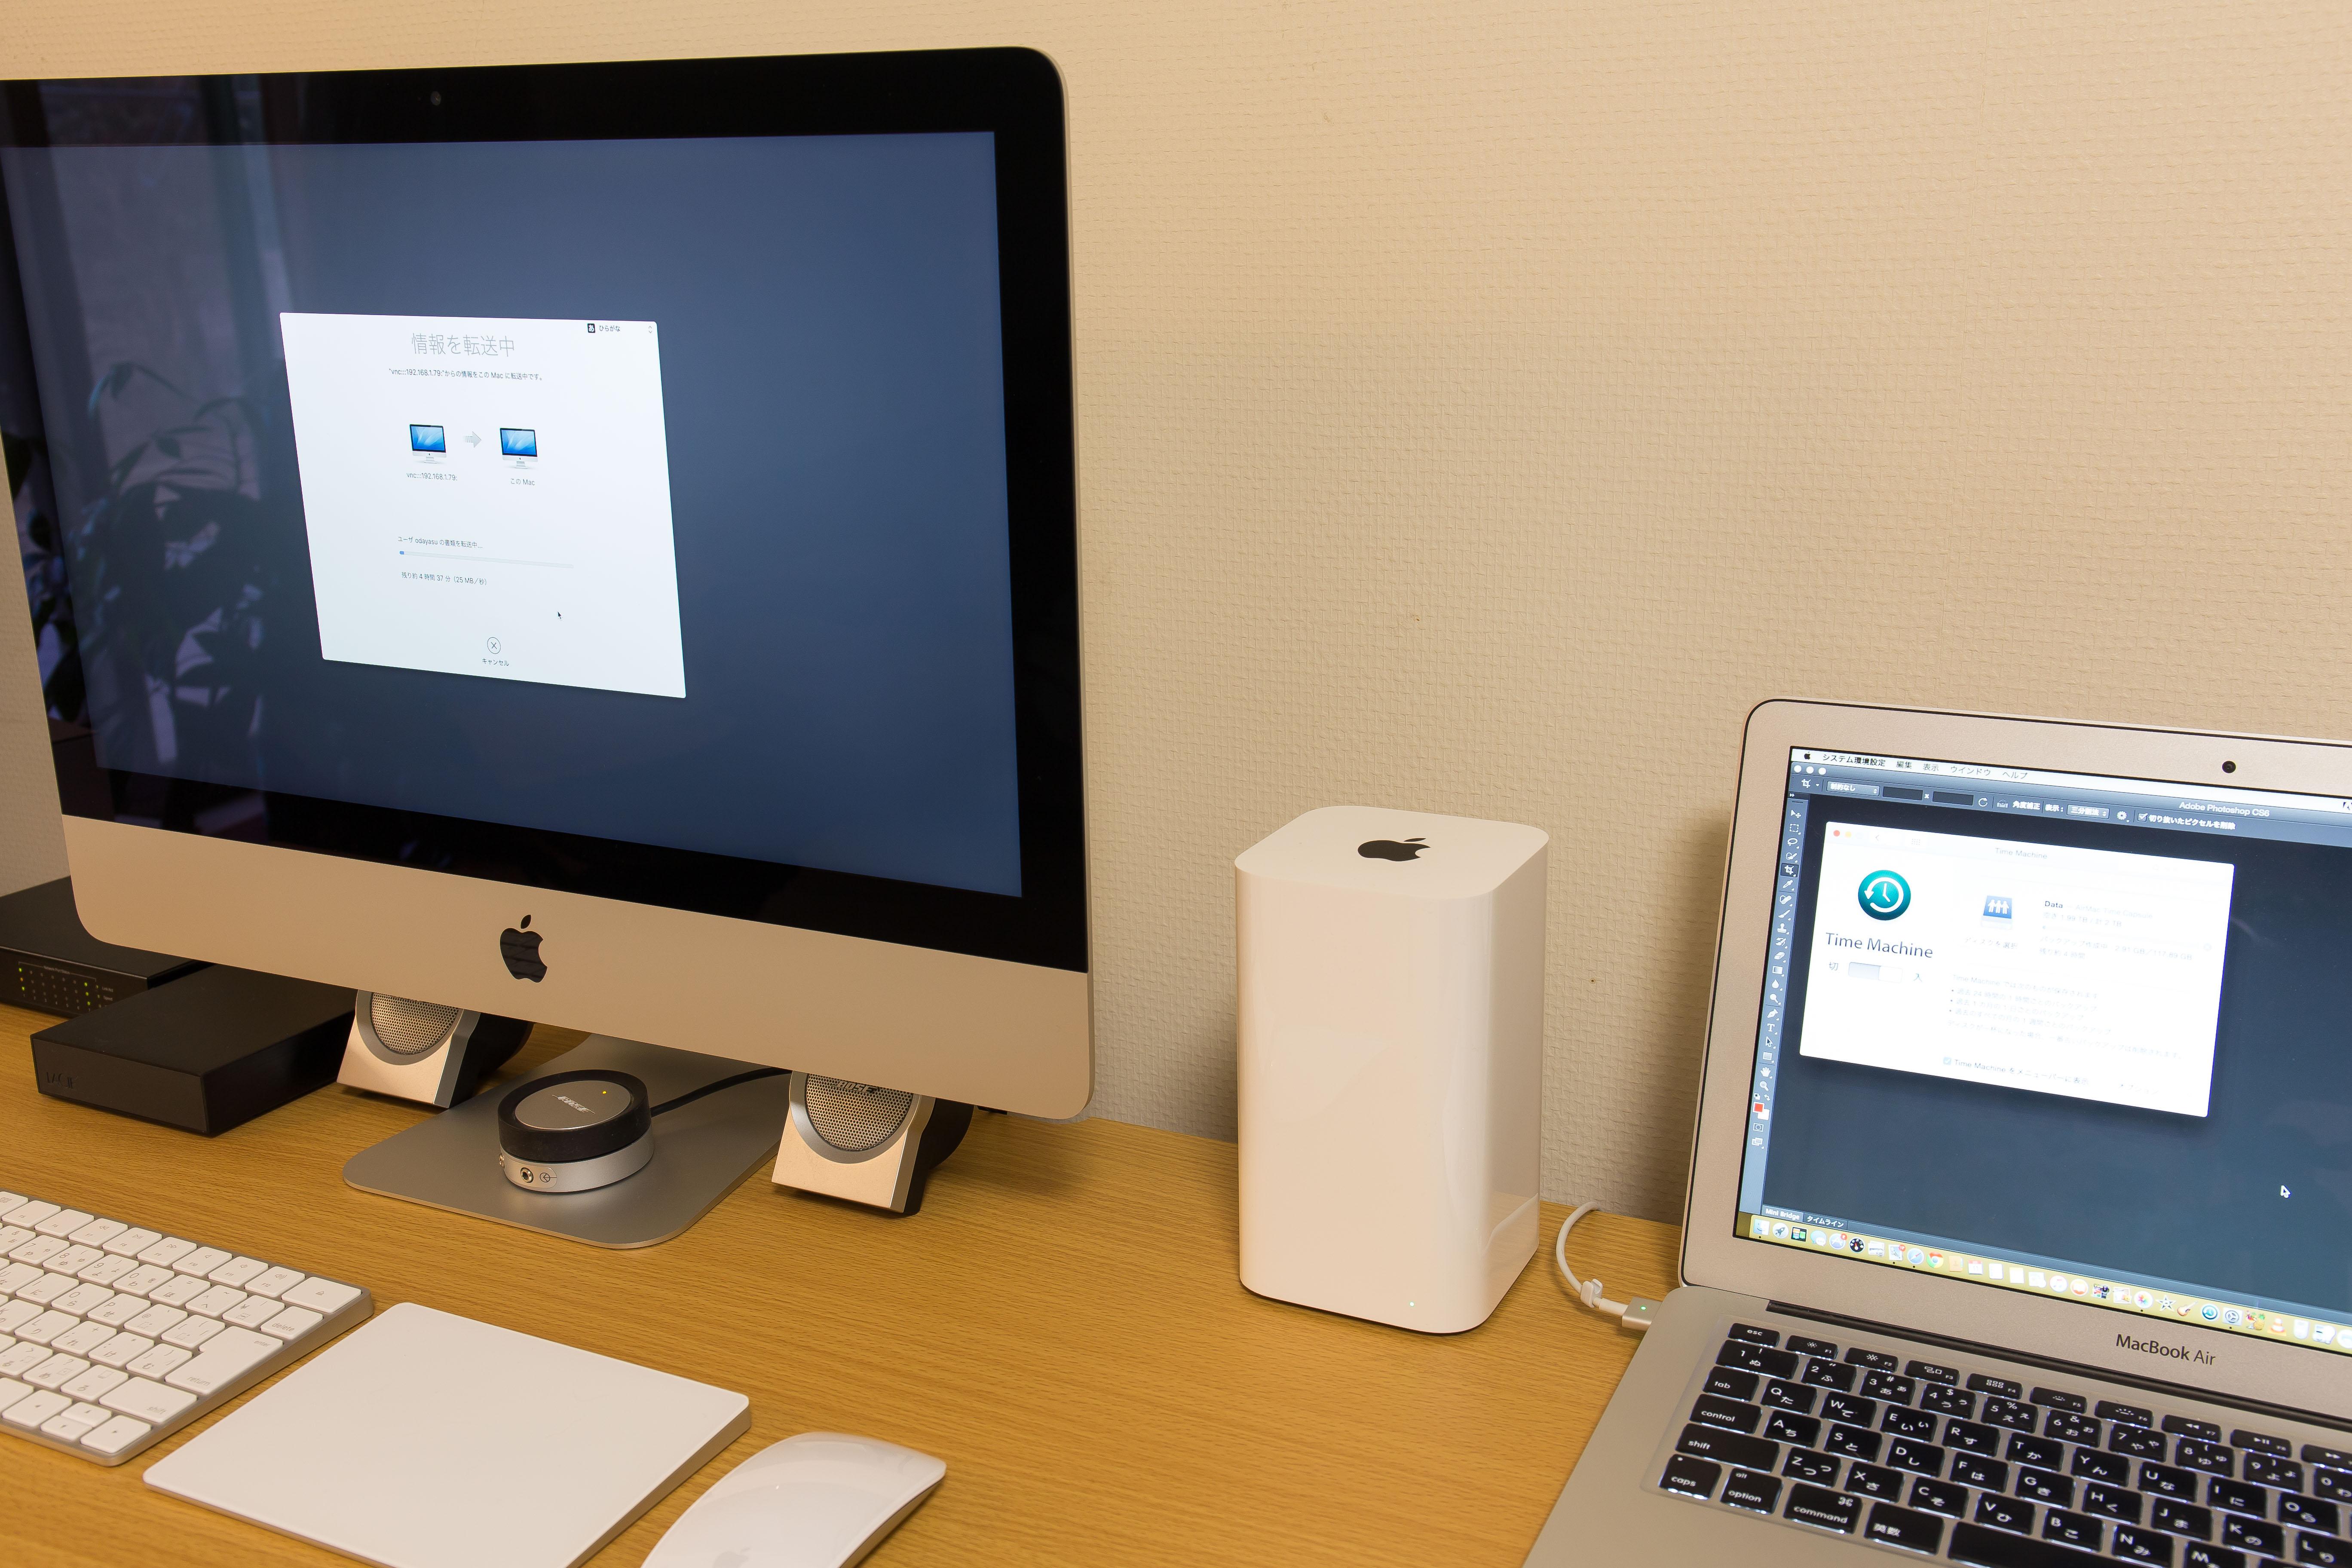 「iMac Retina 21.5インチ」購入(10)